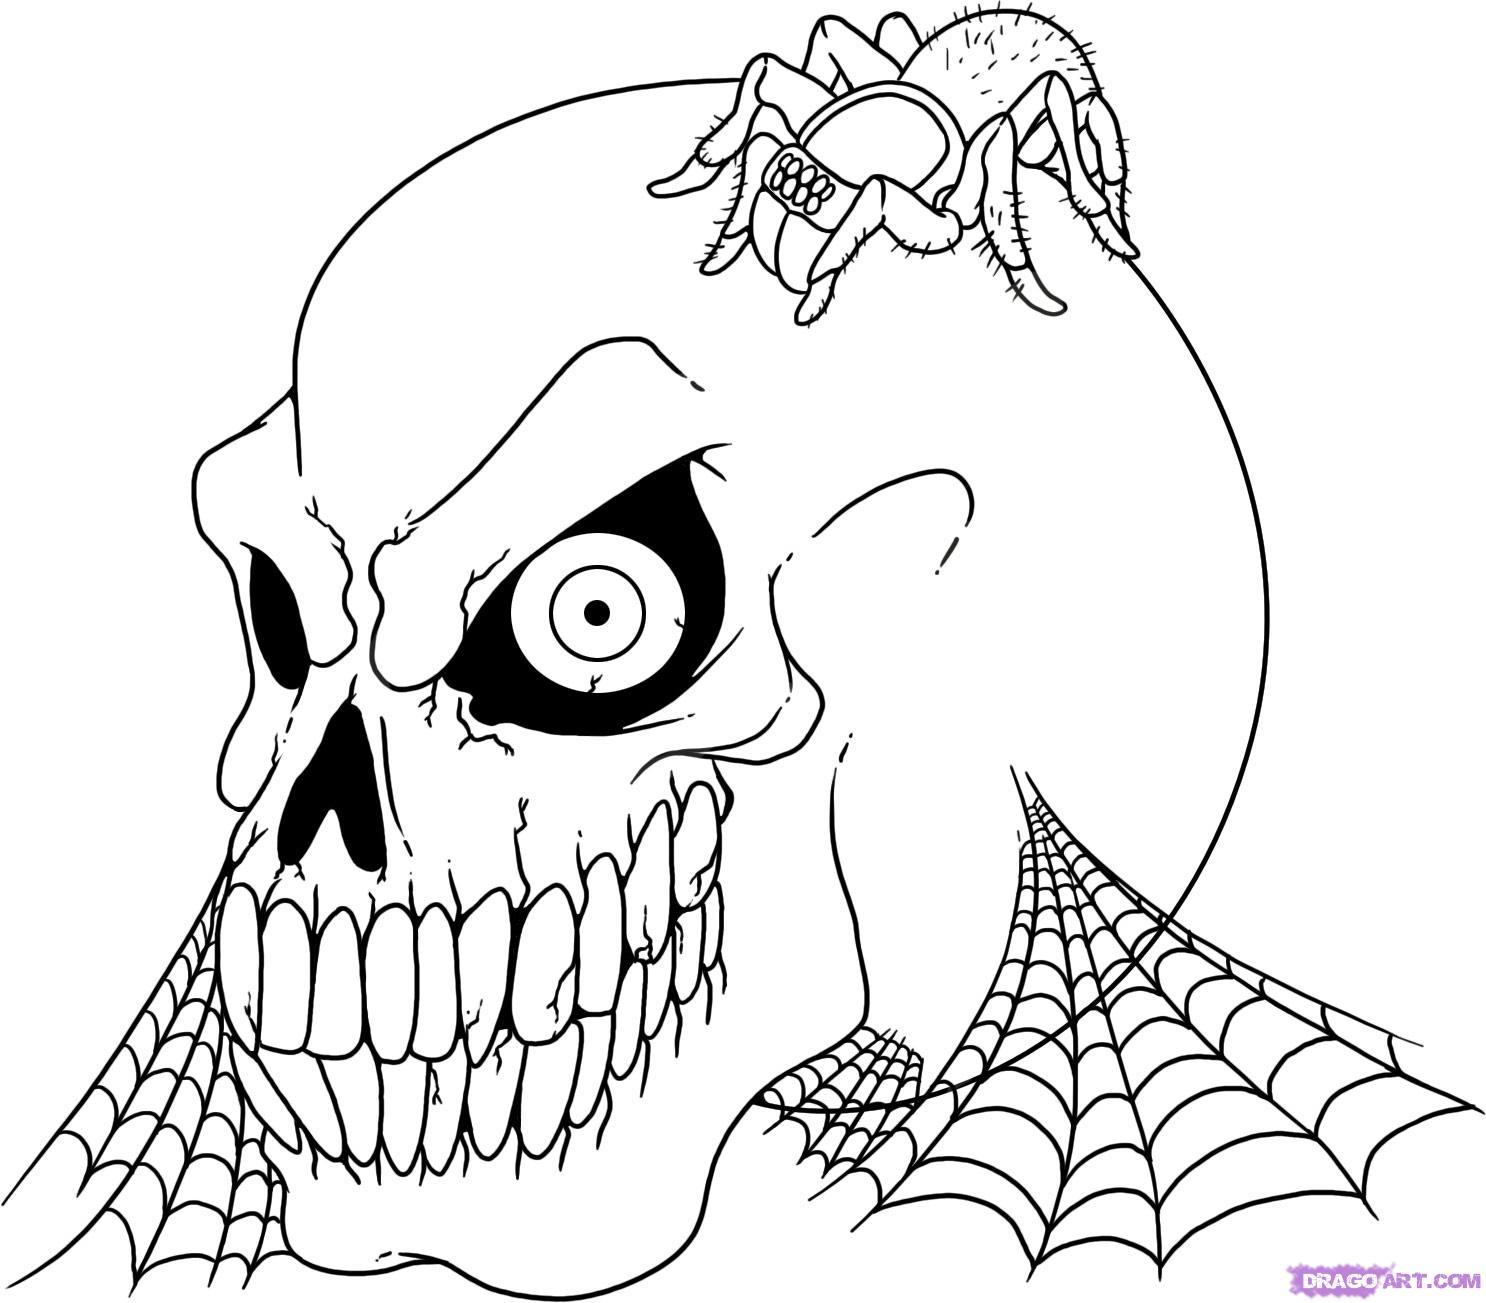 Drawn sleleton printable halloween Kids For Free For With